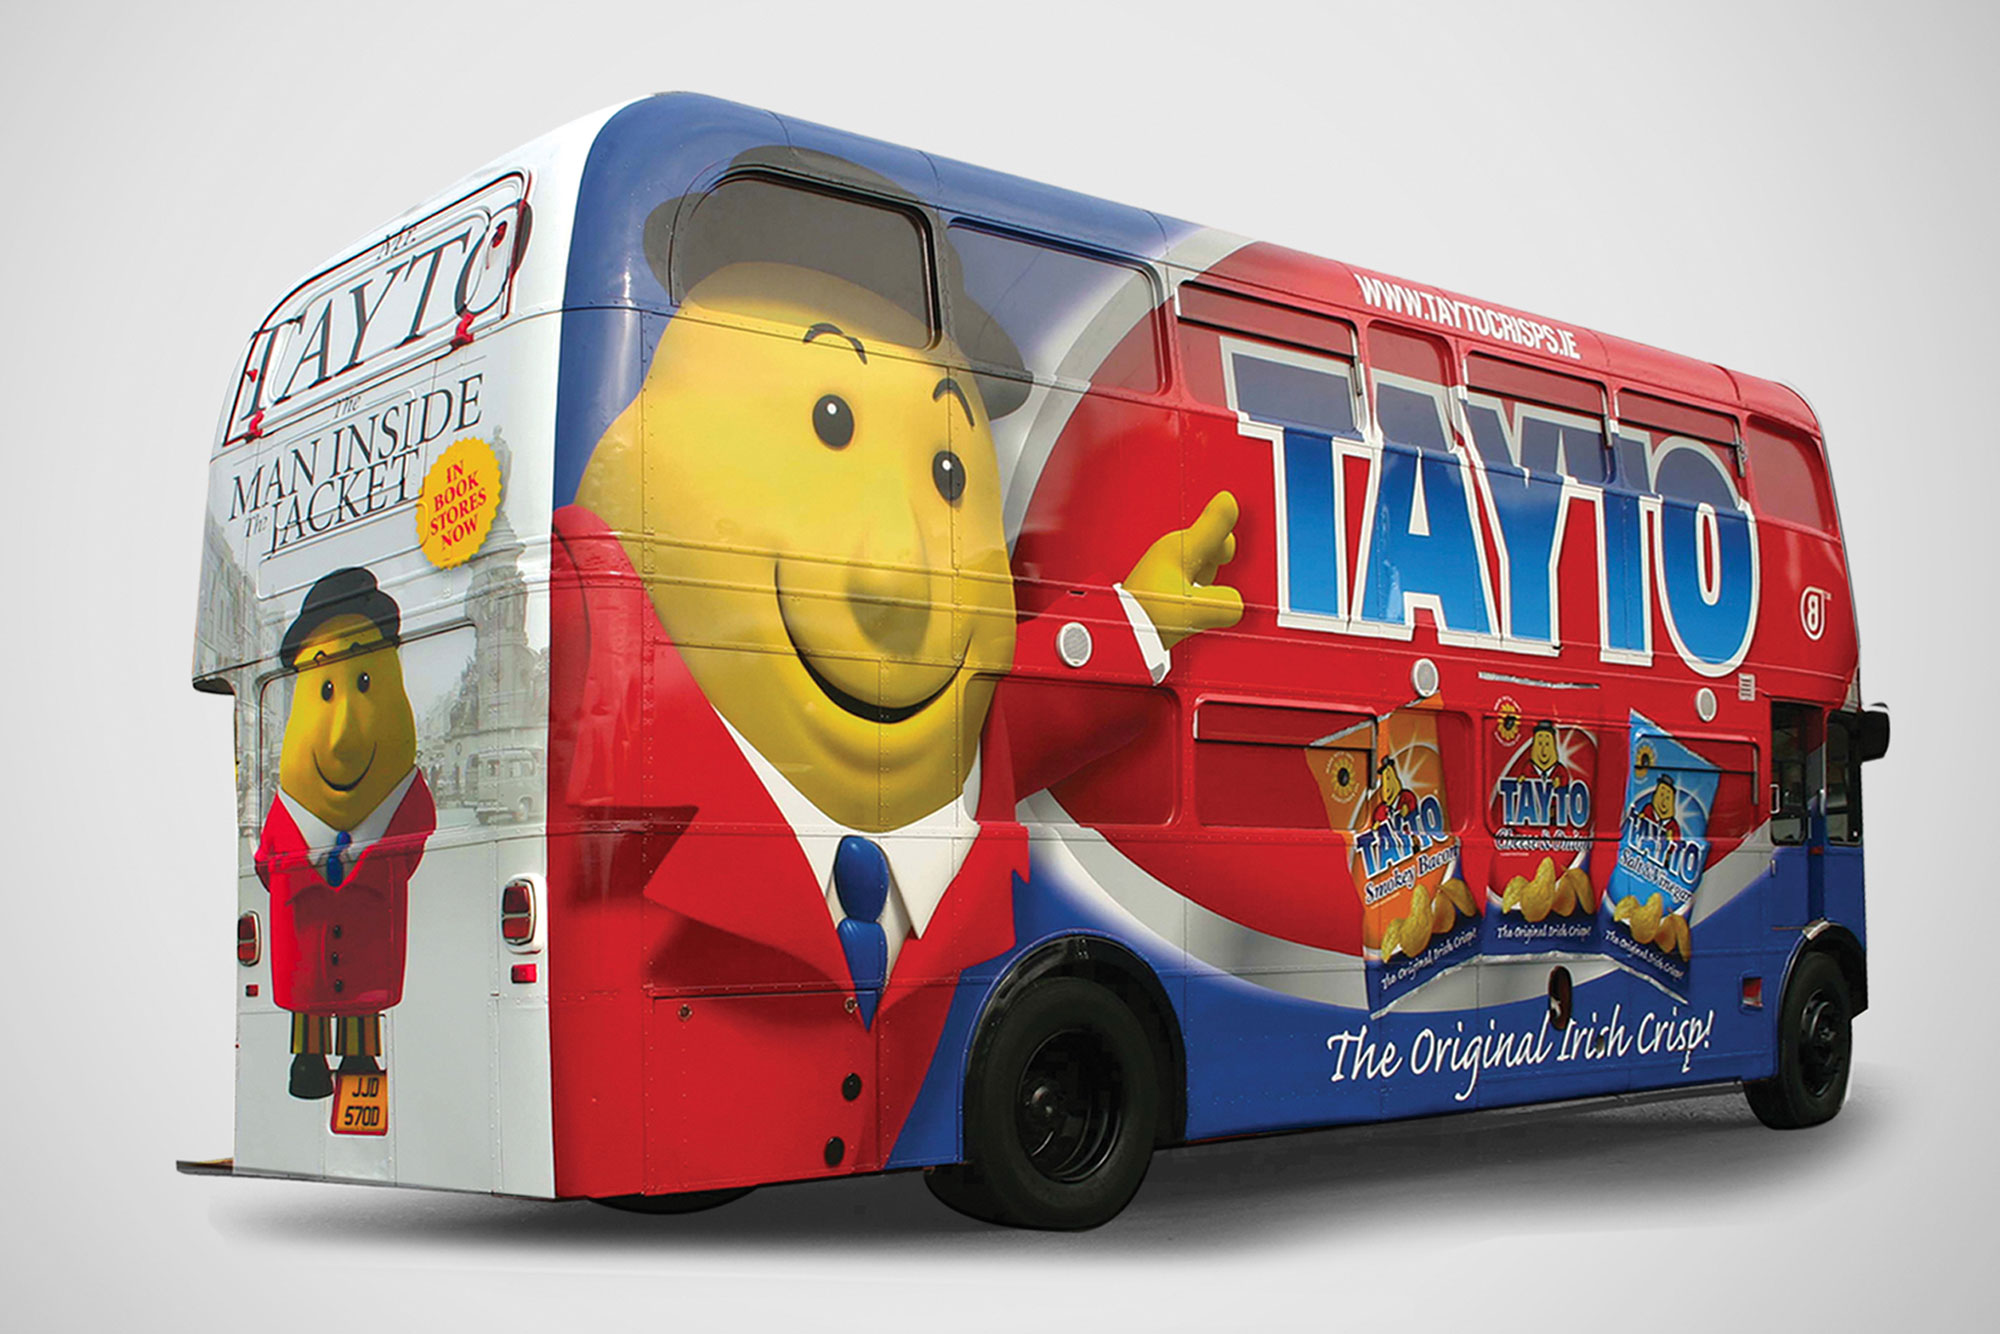 Tayto bus vehicle wrap decal graphic design freelance Dublin